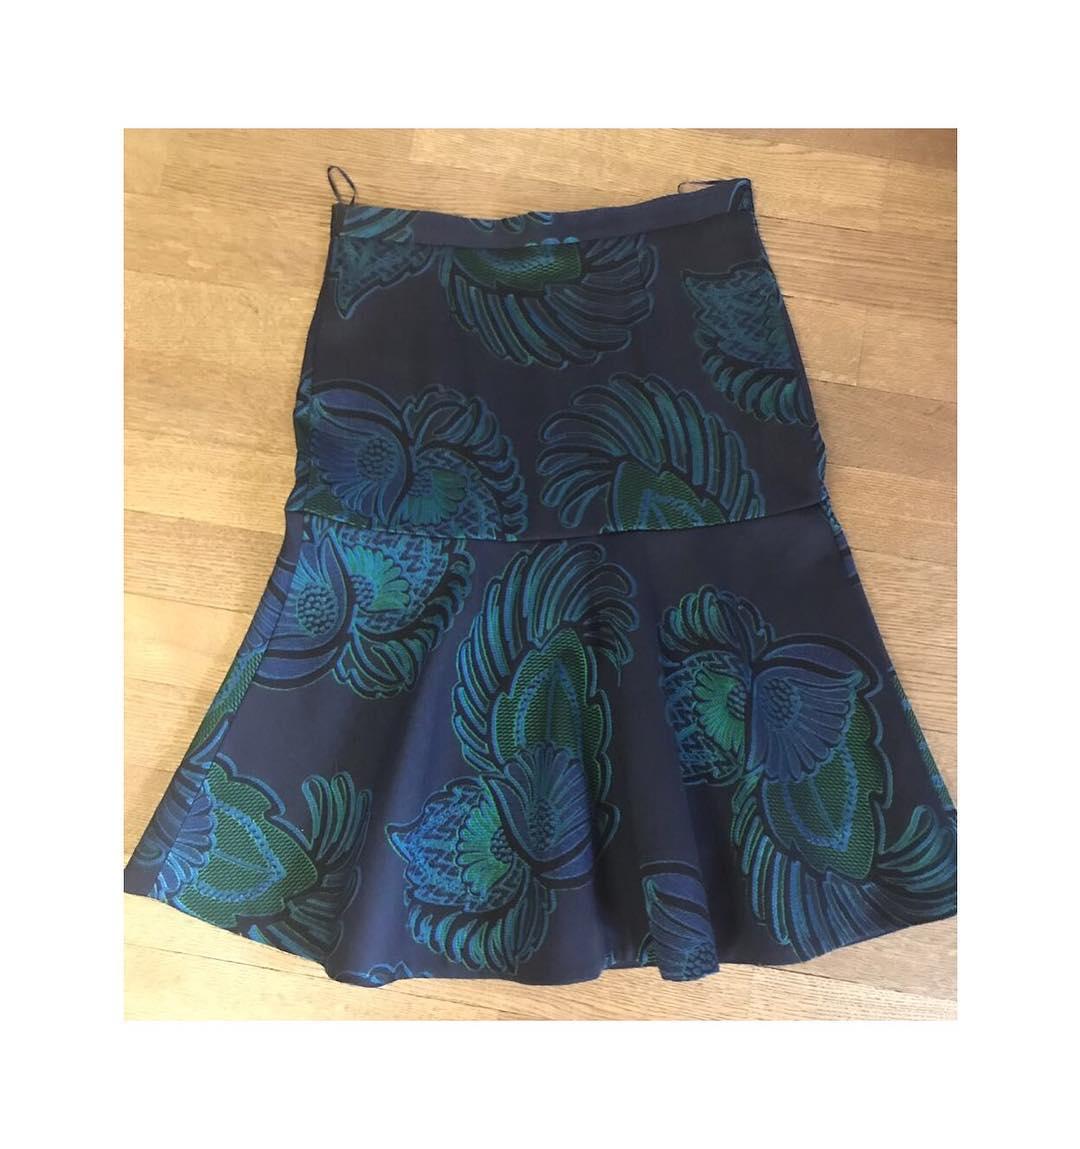 7ffe4903a21 Купить юбку Stella McCartney за 12080 руб. в интернет магазине ...